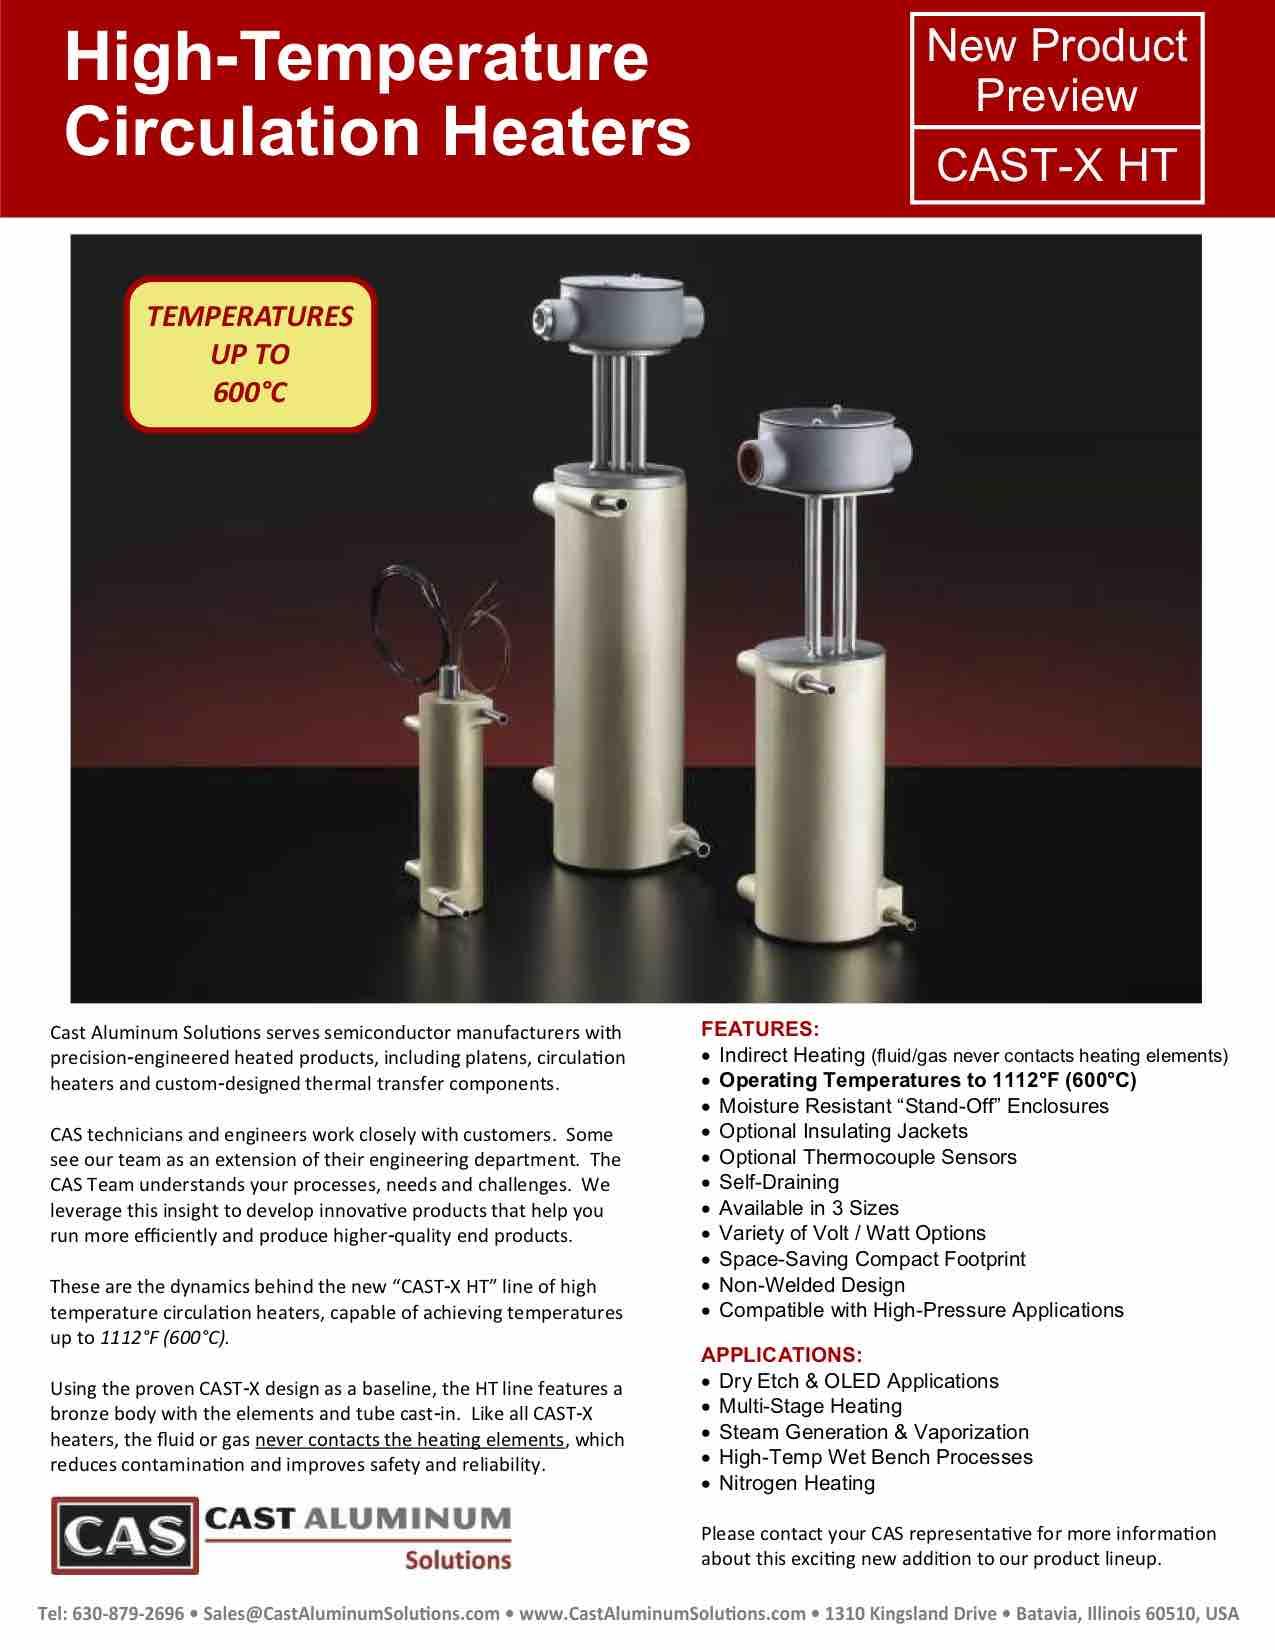 CAST X High Temp Circulation Heaters Cast Aluminum Solutions (dragged)